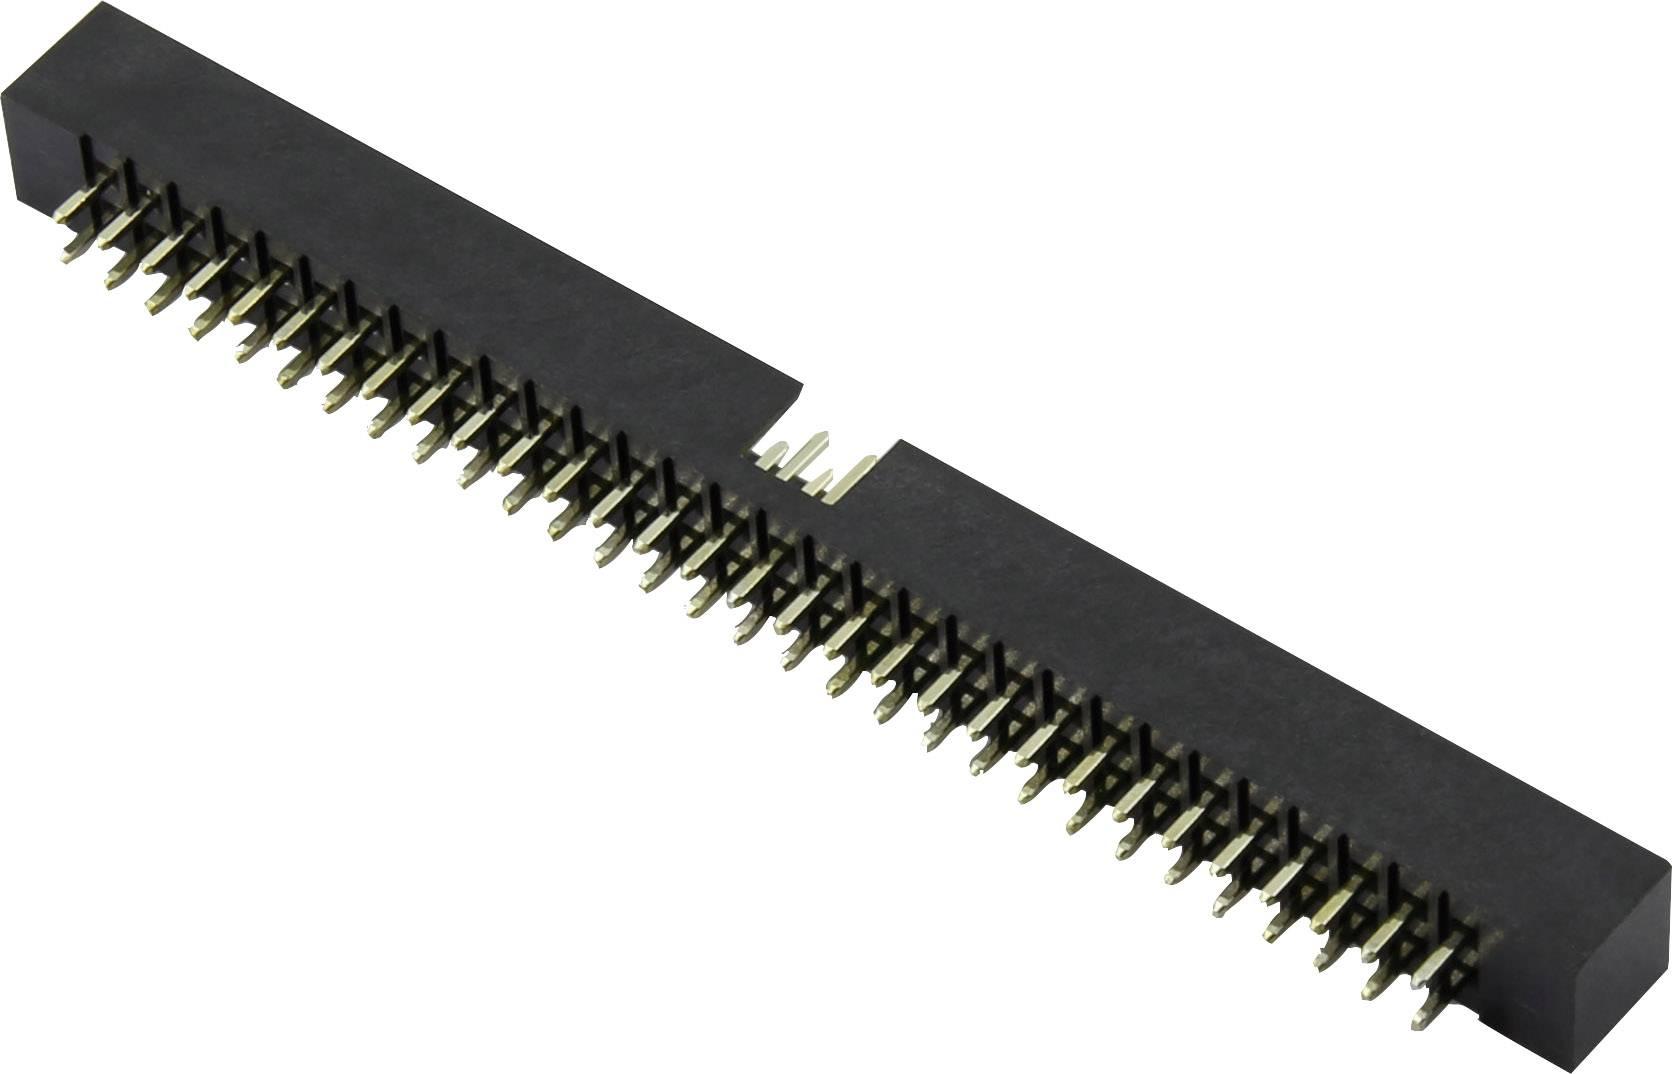 Konektor pro ploché kabely Connfly DS1014-14SF1B, rastr (rozteč): 2 mm, počet pólů: 14, 1 ks